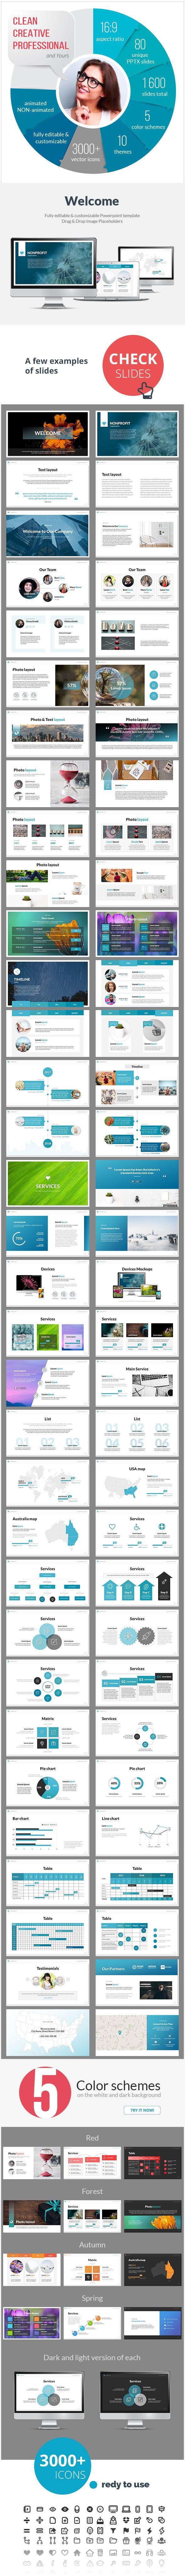 Multipurpose Nonprofit PowerPoint Presentation Template